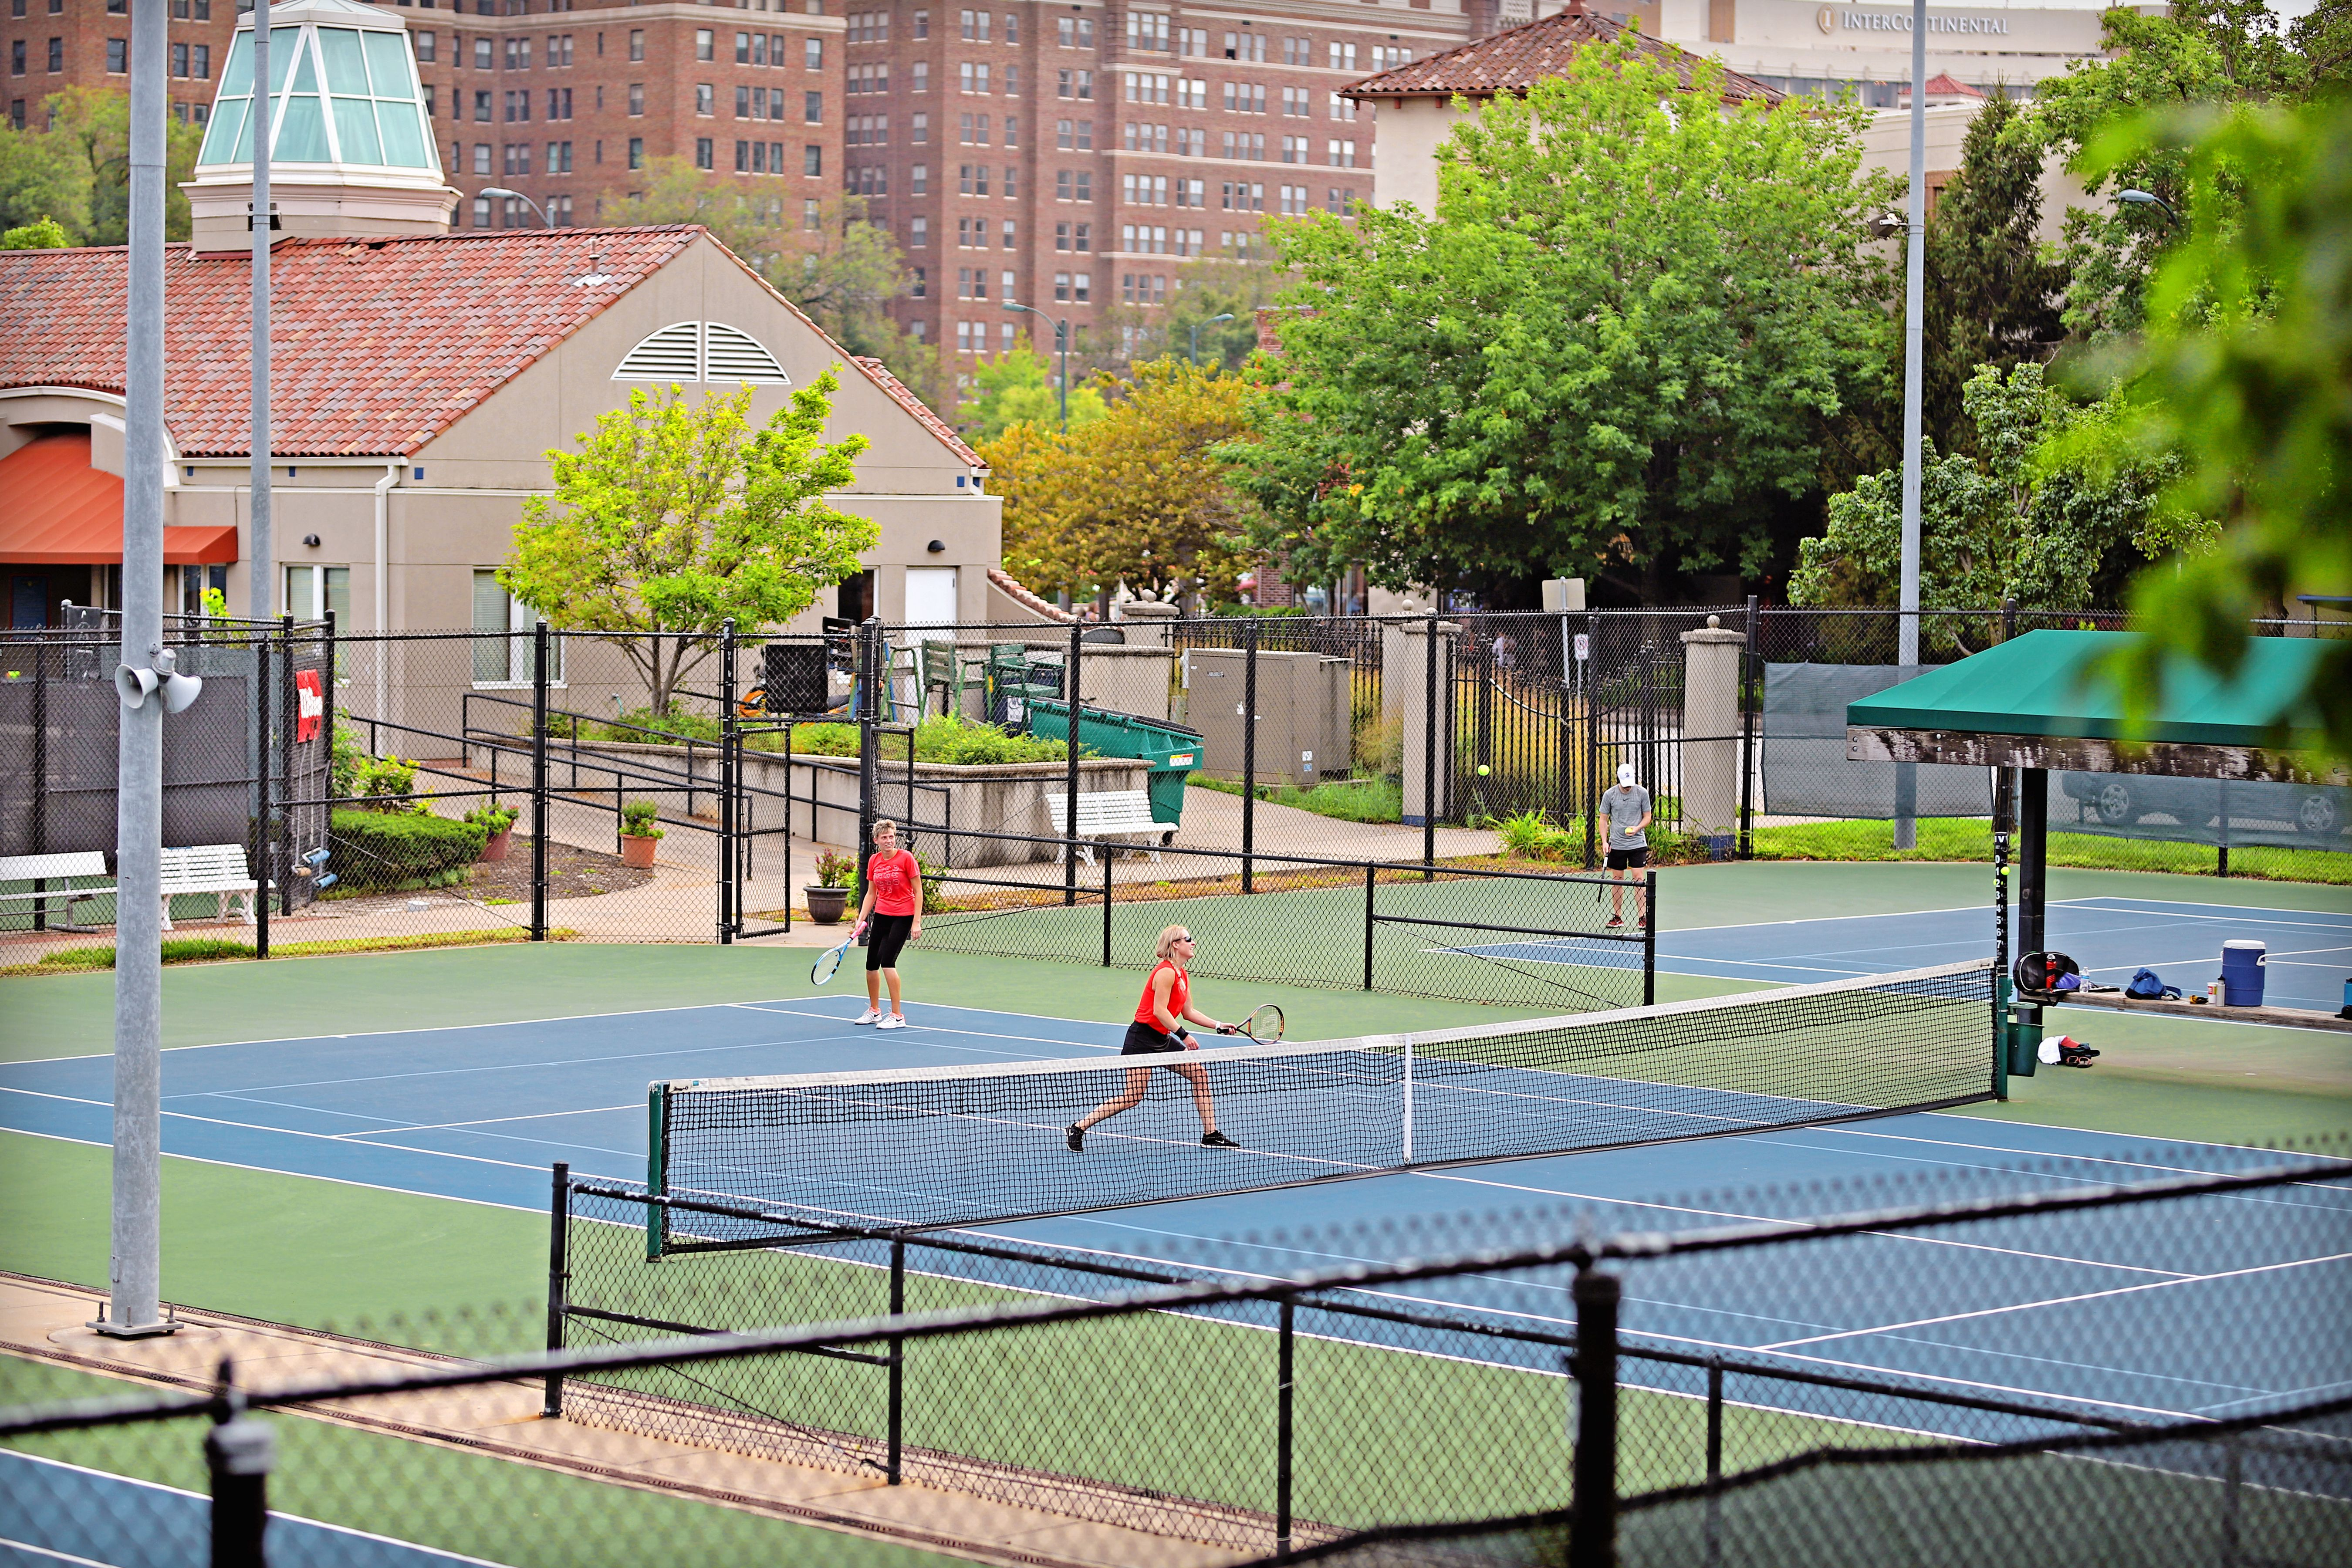 Plaza Tennis Center